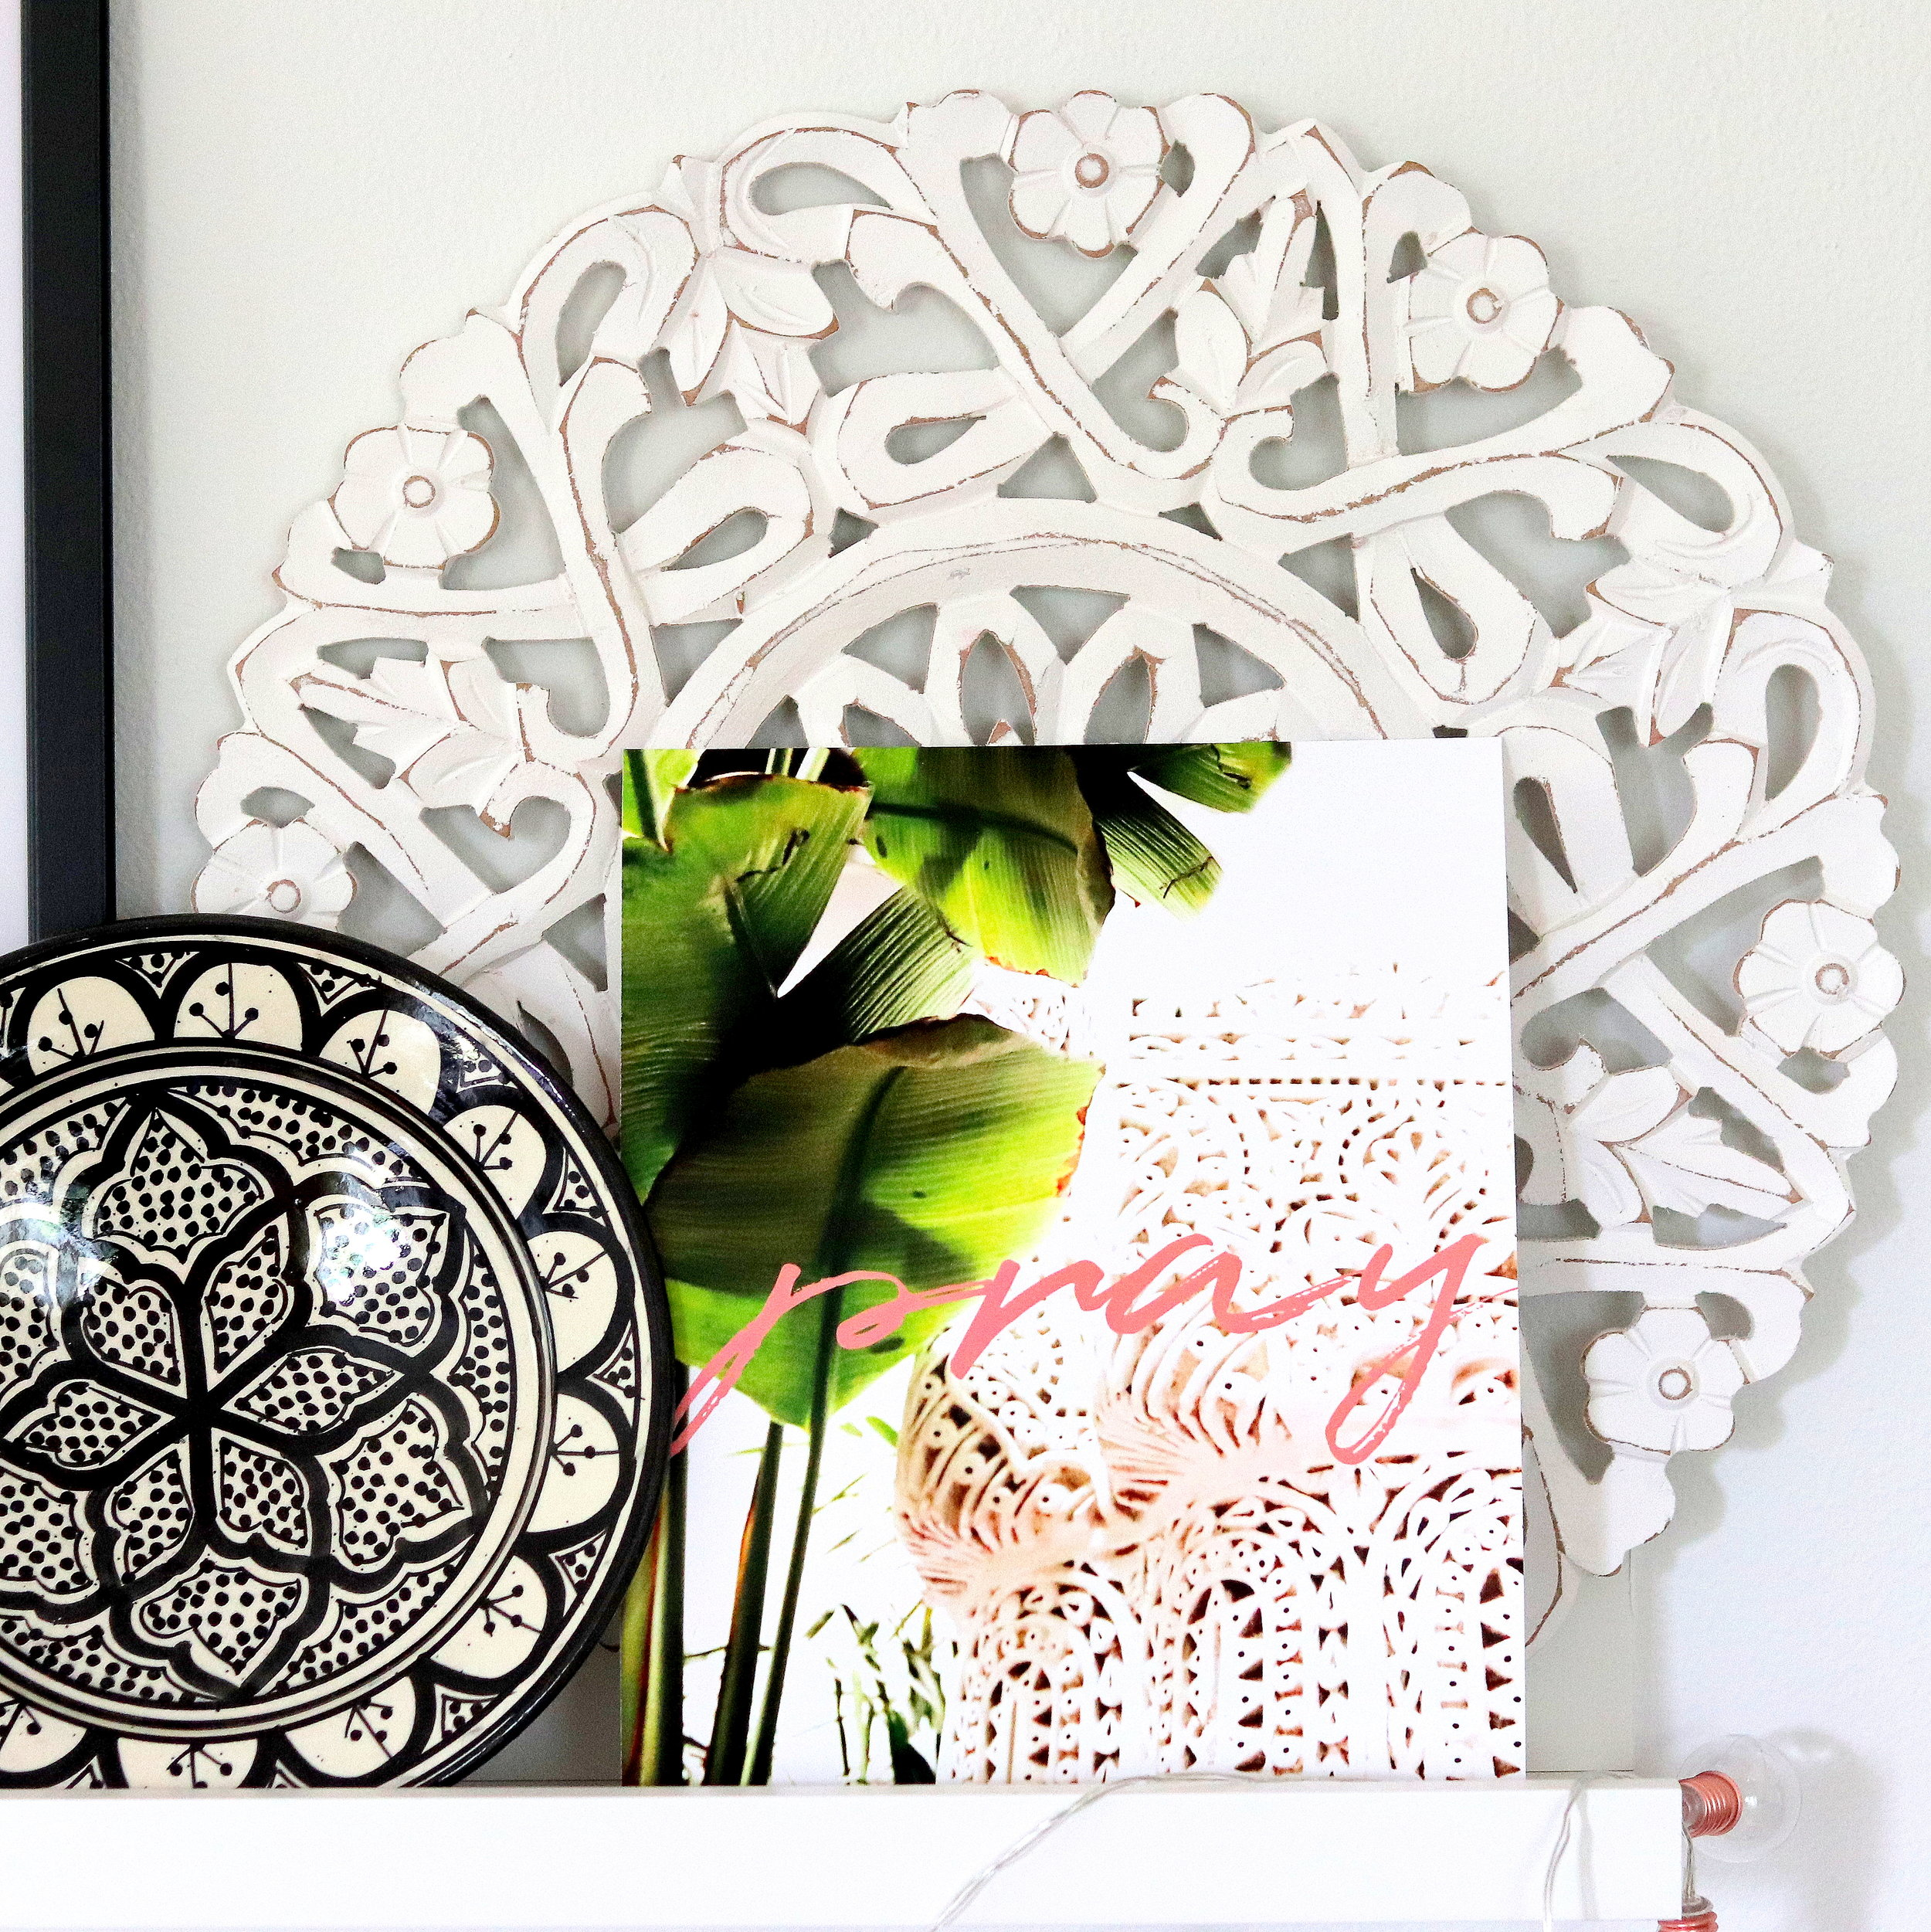 Moroccan Print Design Modern Arabesque Home Decor Pray Artwork Print